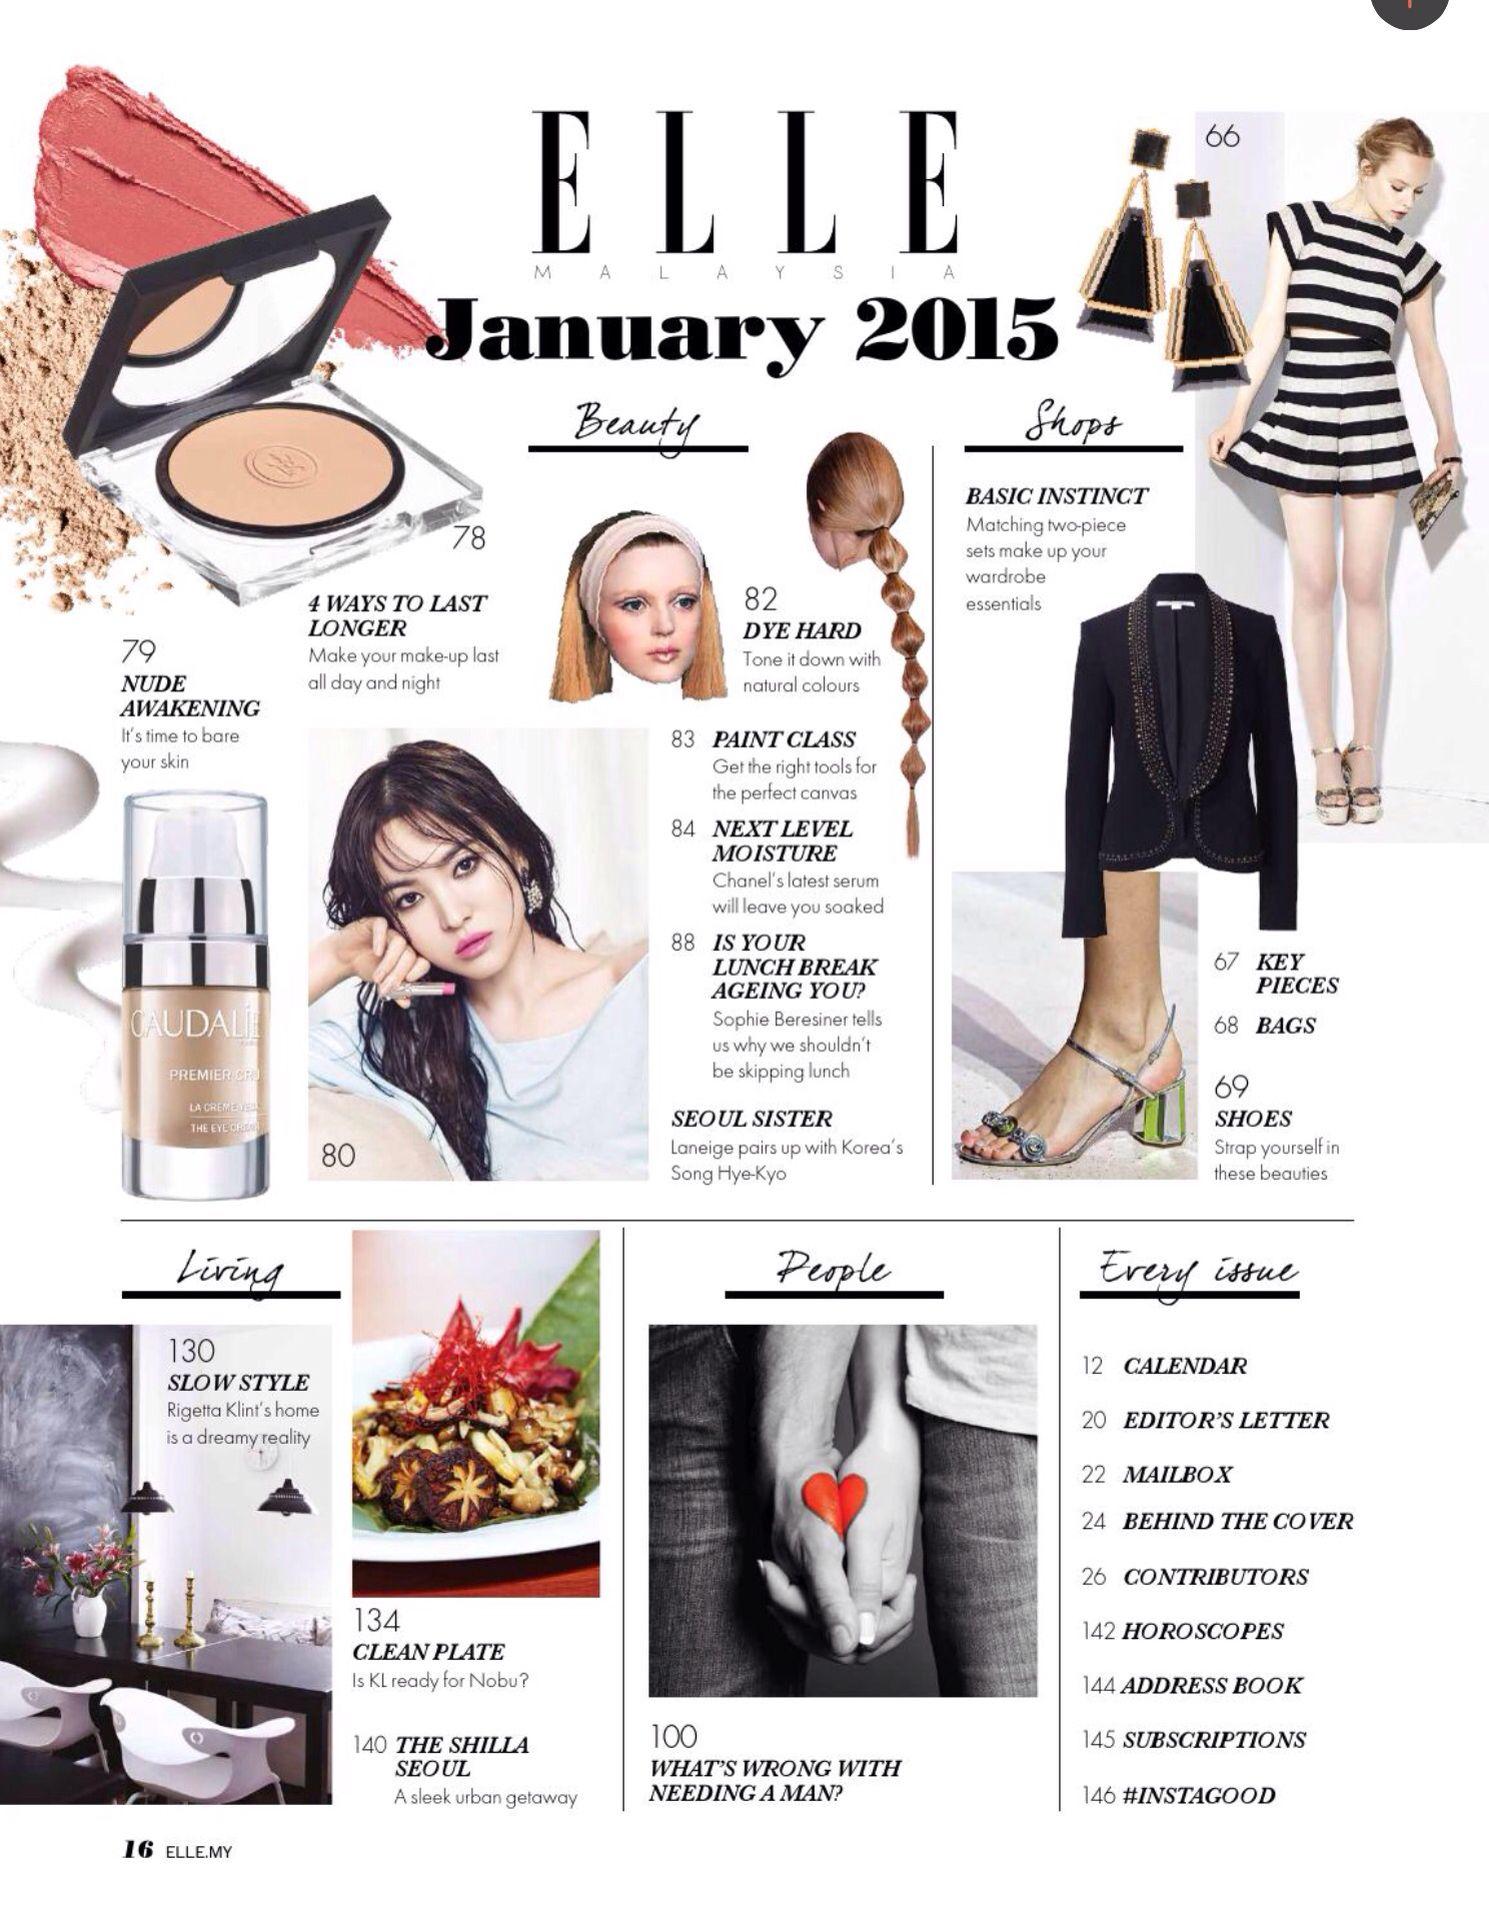 Elle Malaysia | magazine layout | Pinterest | Malaysia ...